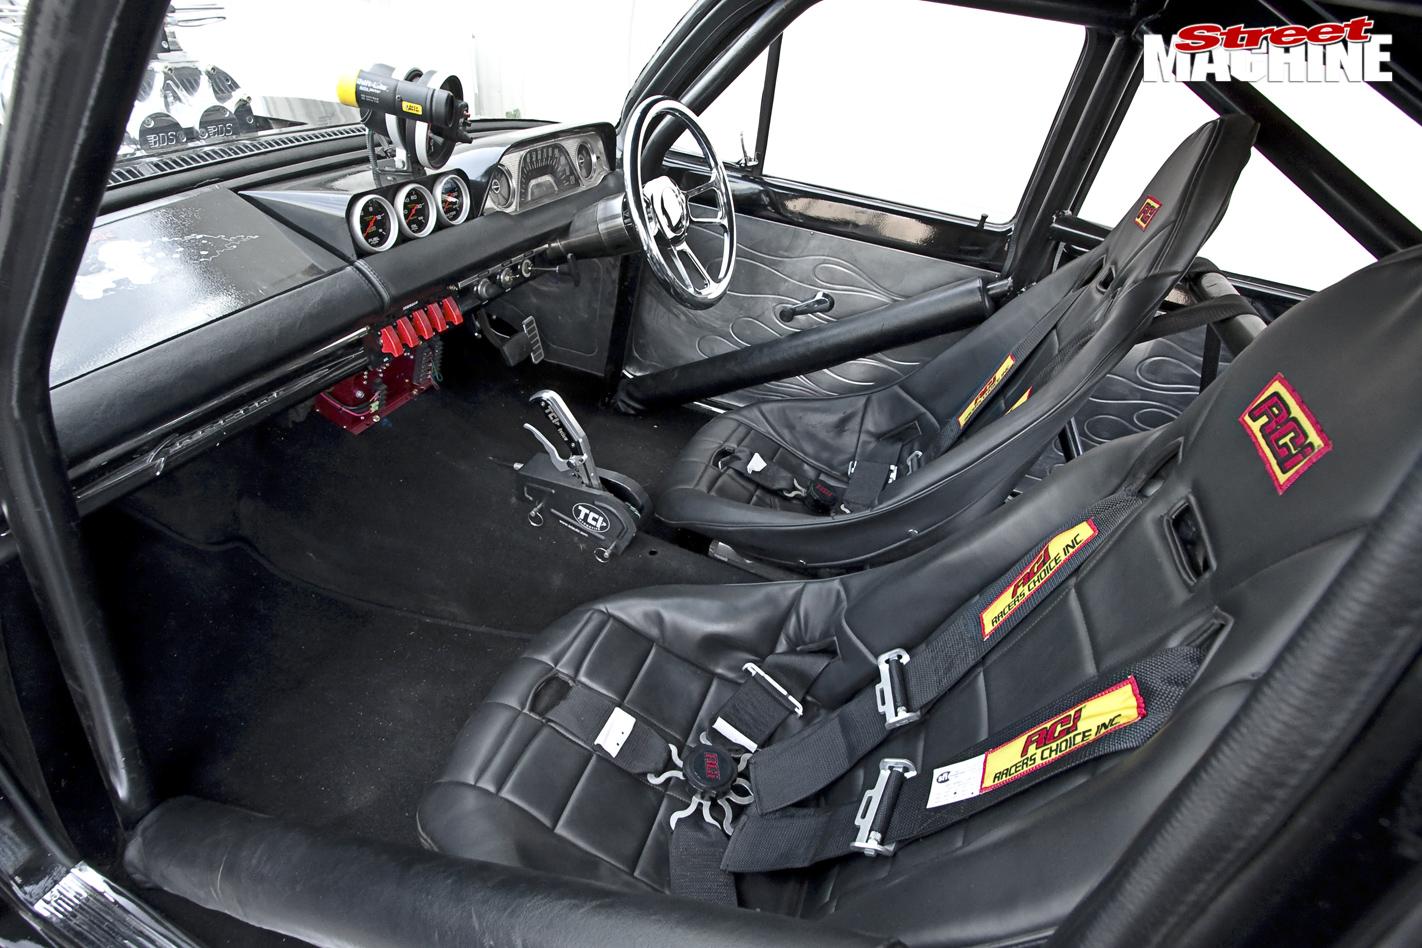 Holden -eh -agro 64-inside -front